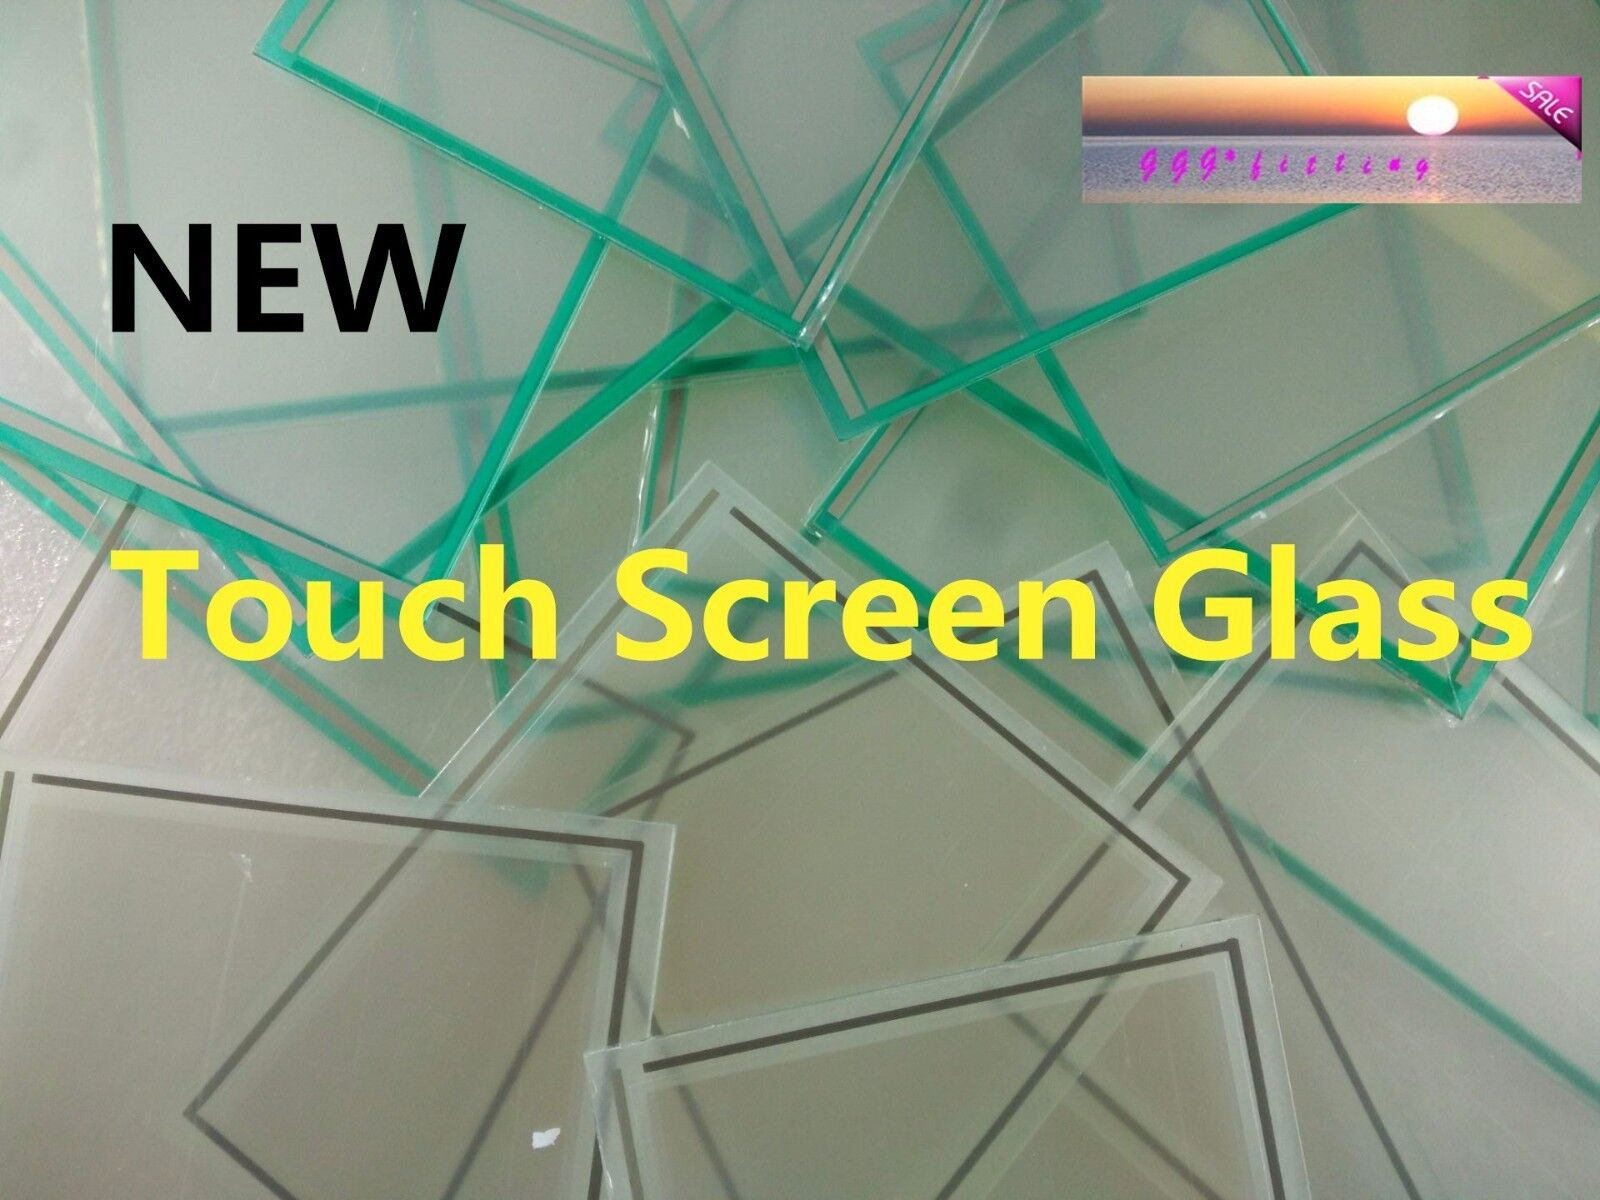 One For AB PanelView Plus 1250 2711P-K12C1D2 2711P-K12C10D2 Touch Screen